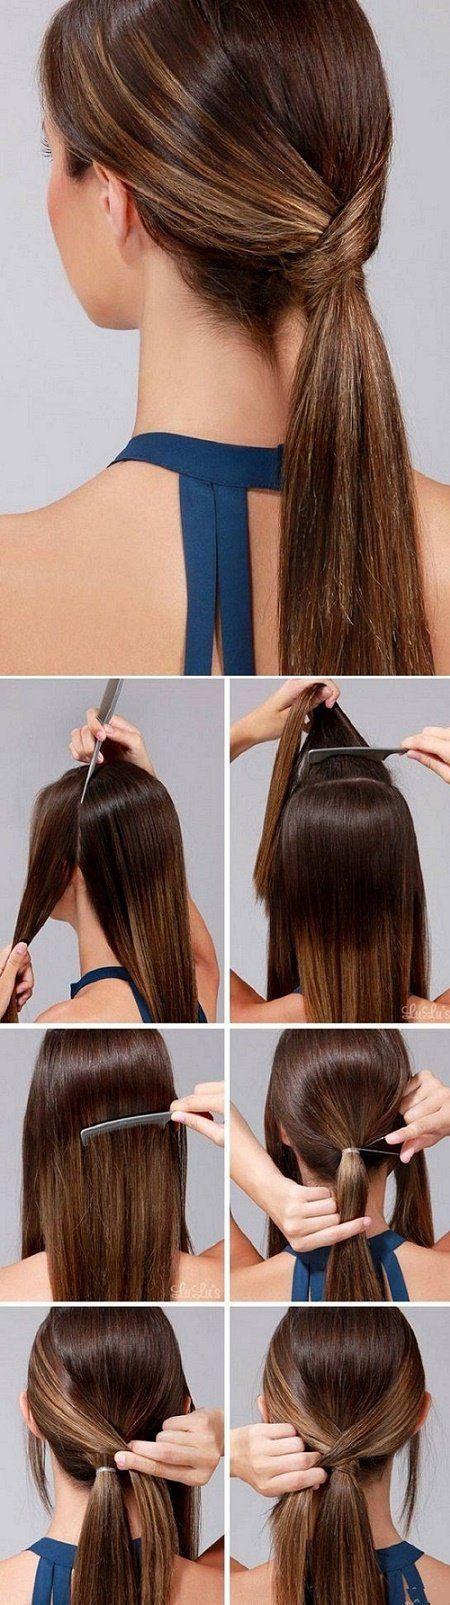 Peinados Para Bodas Ideales Para Invitadas Hair Beauty